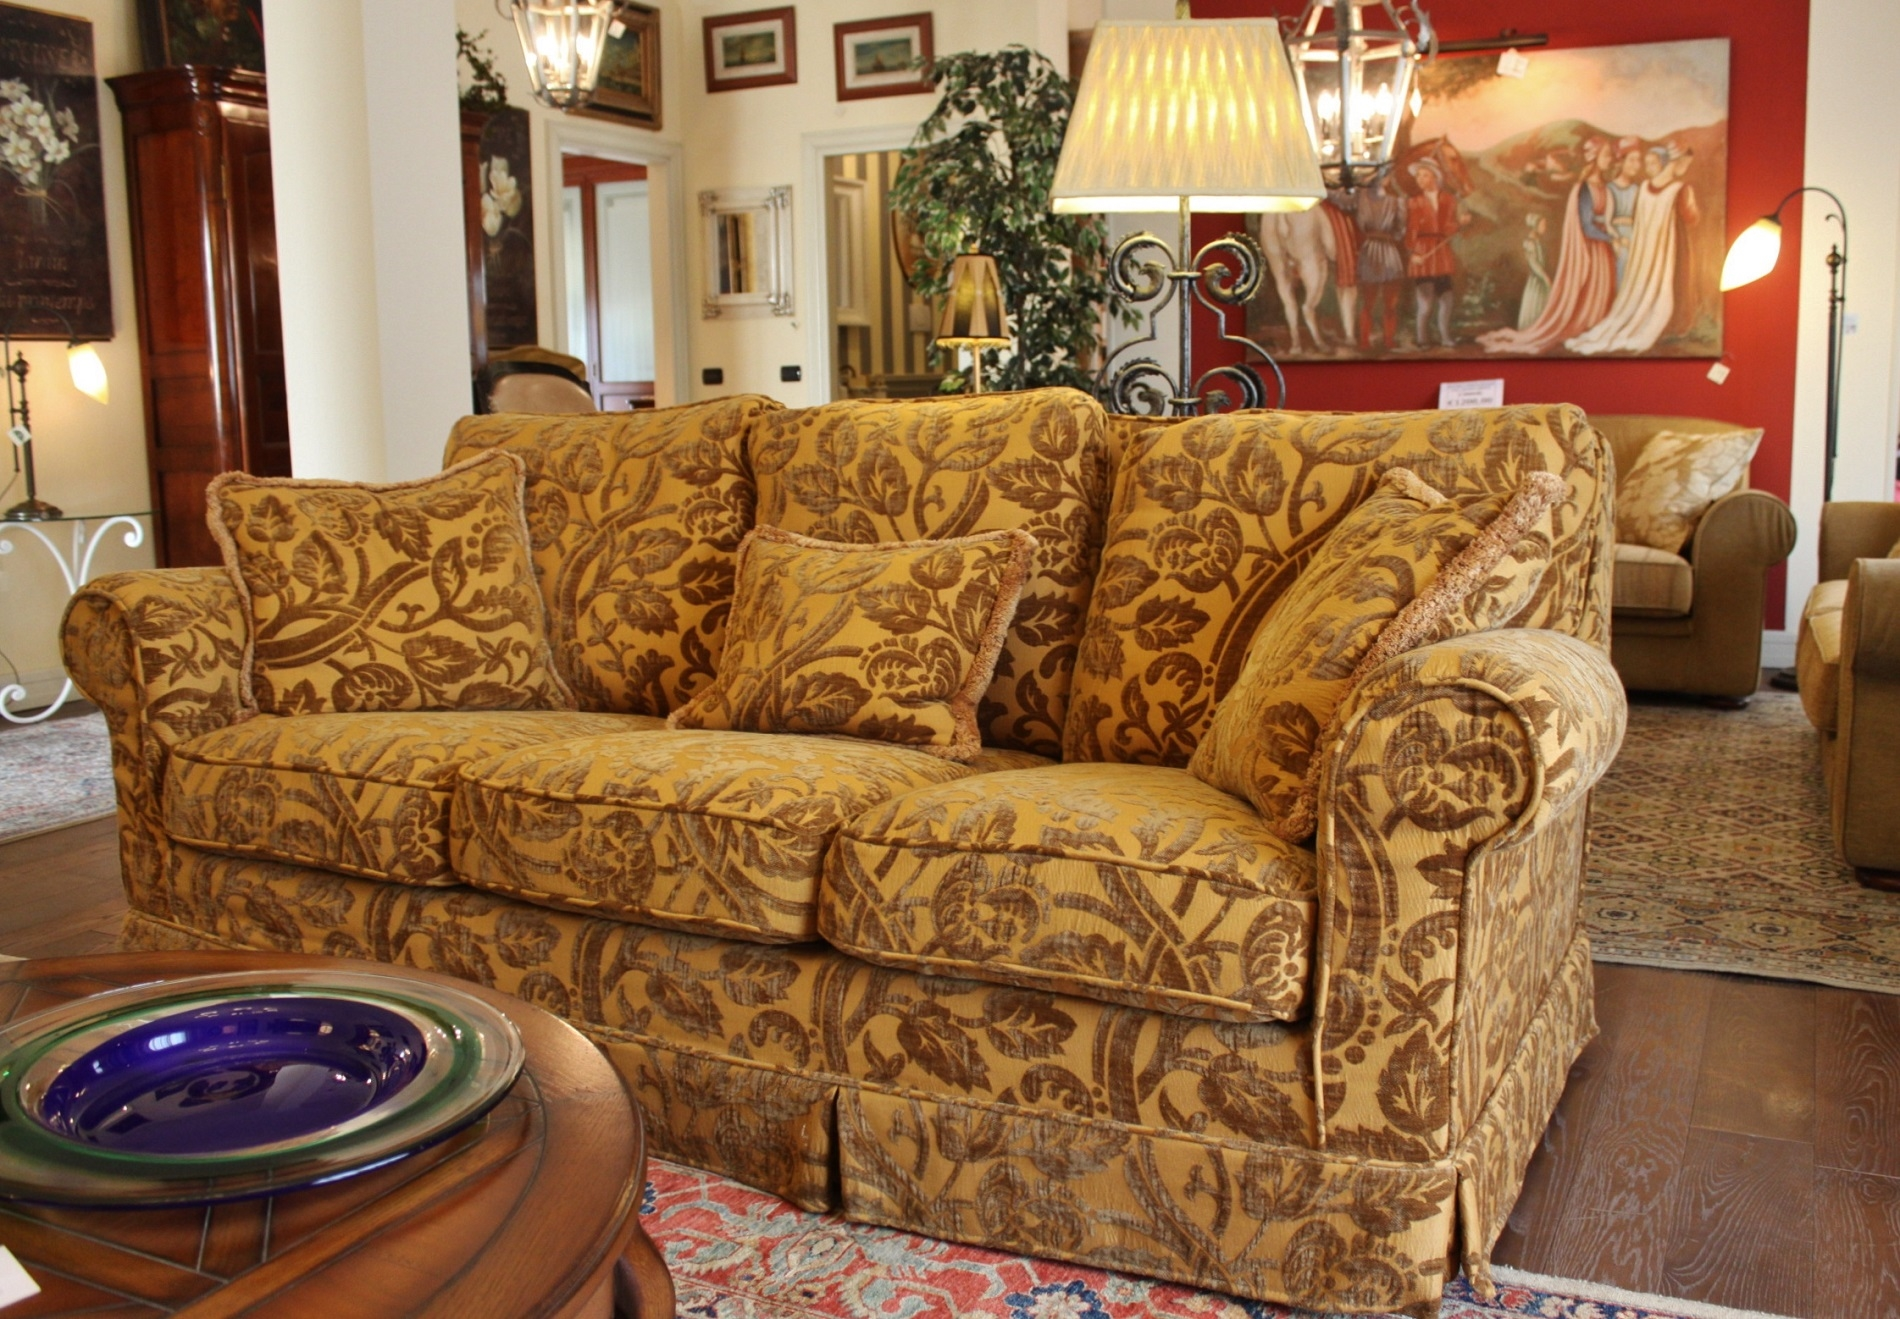 divani usati firenze - 28 images - divani chester usati firenze ...